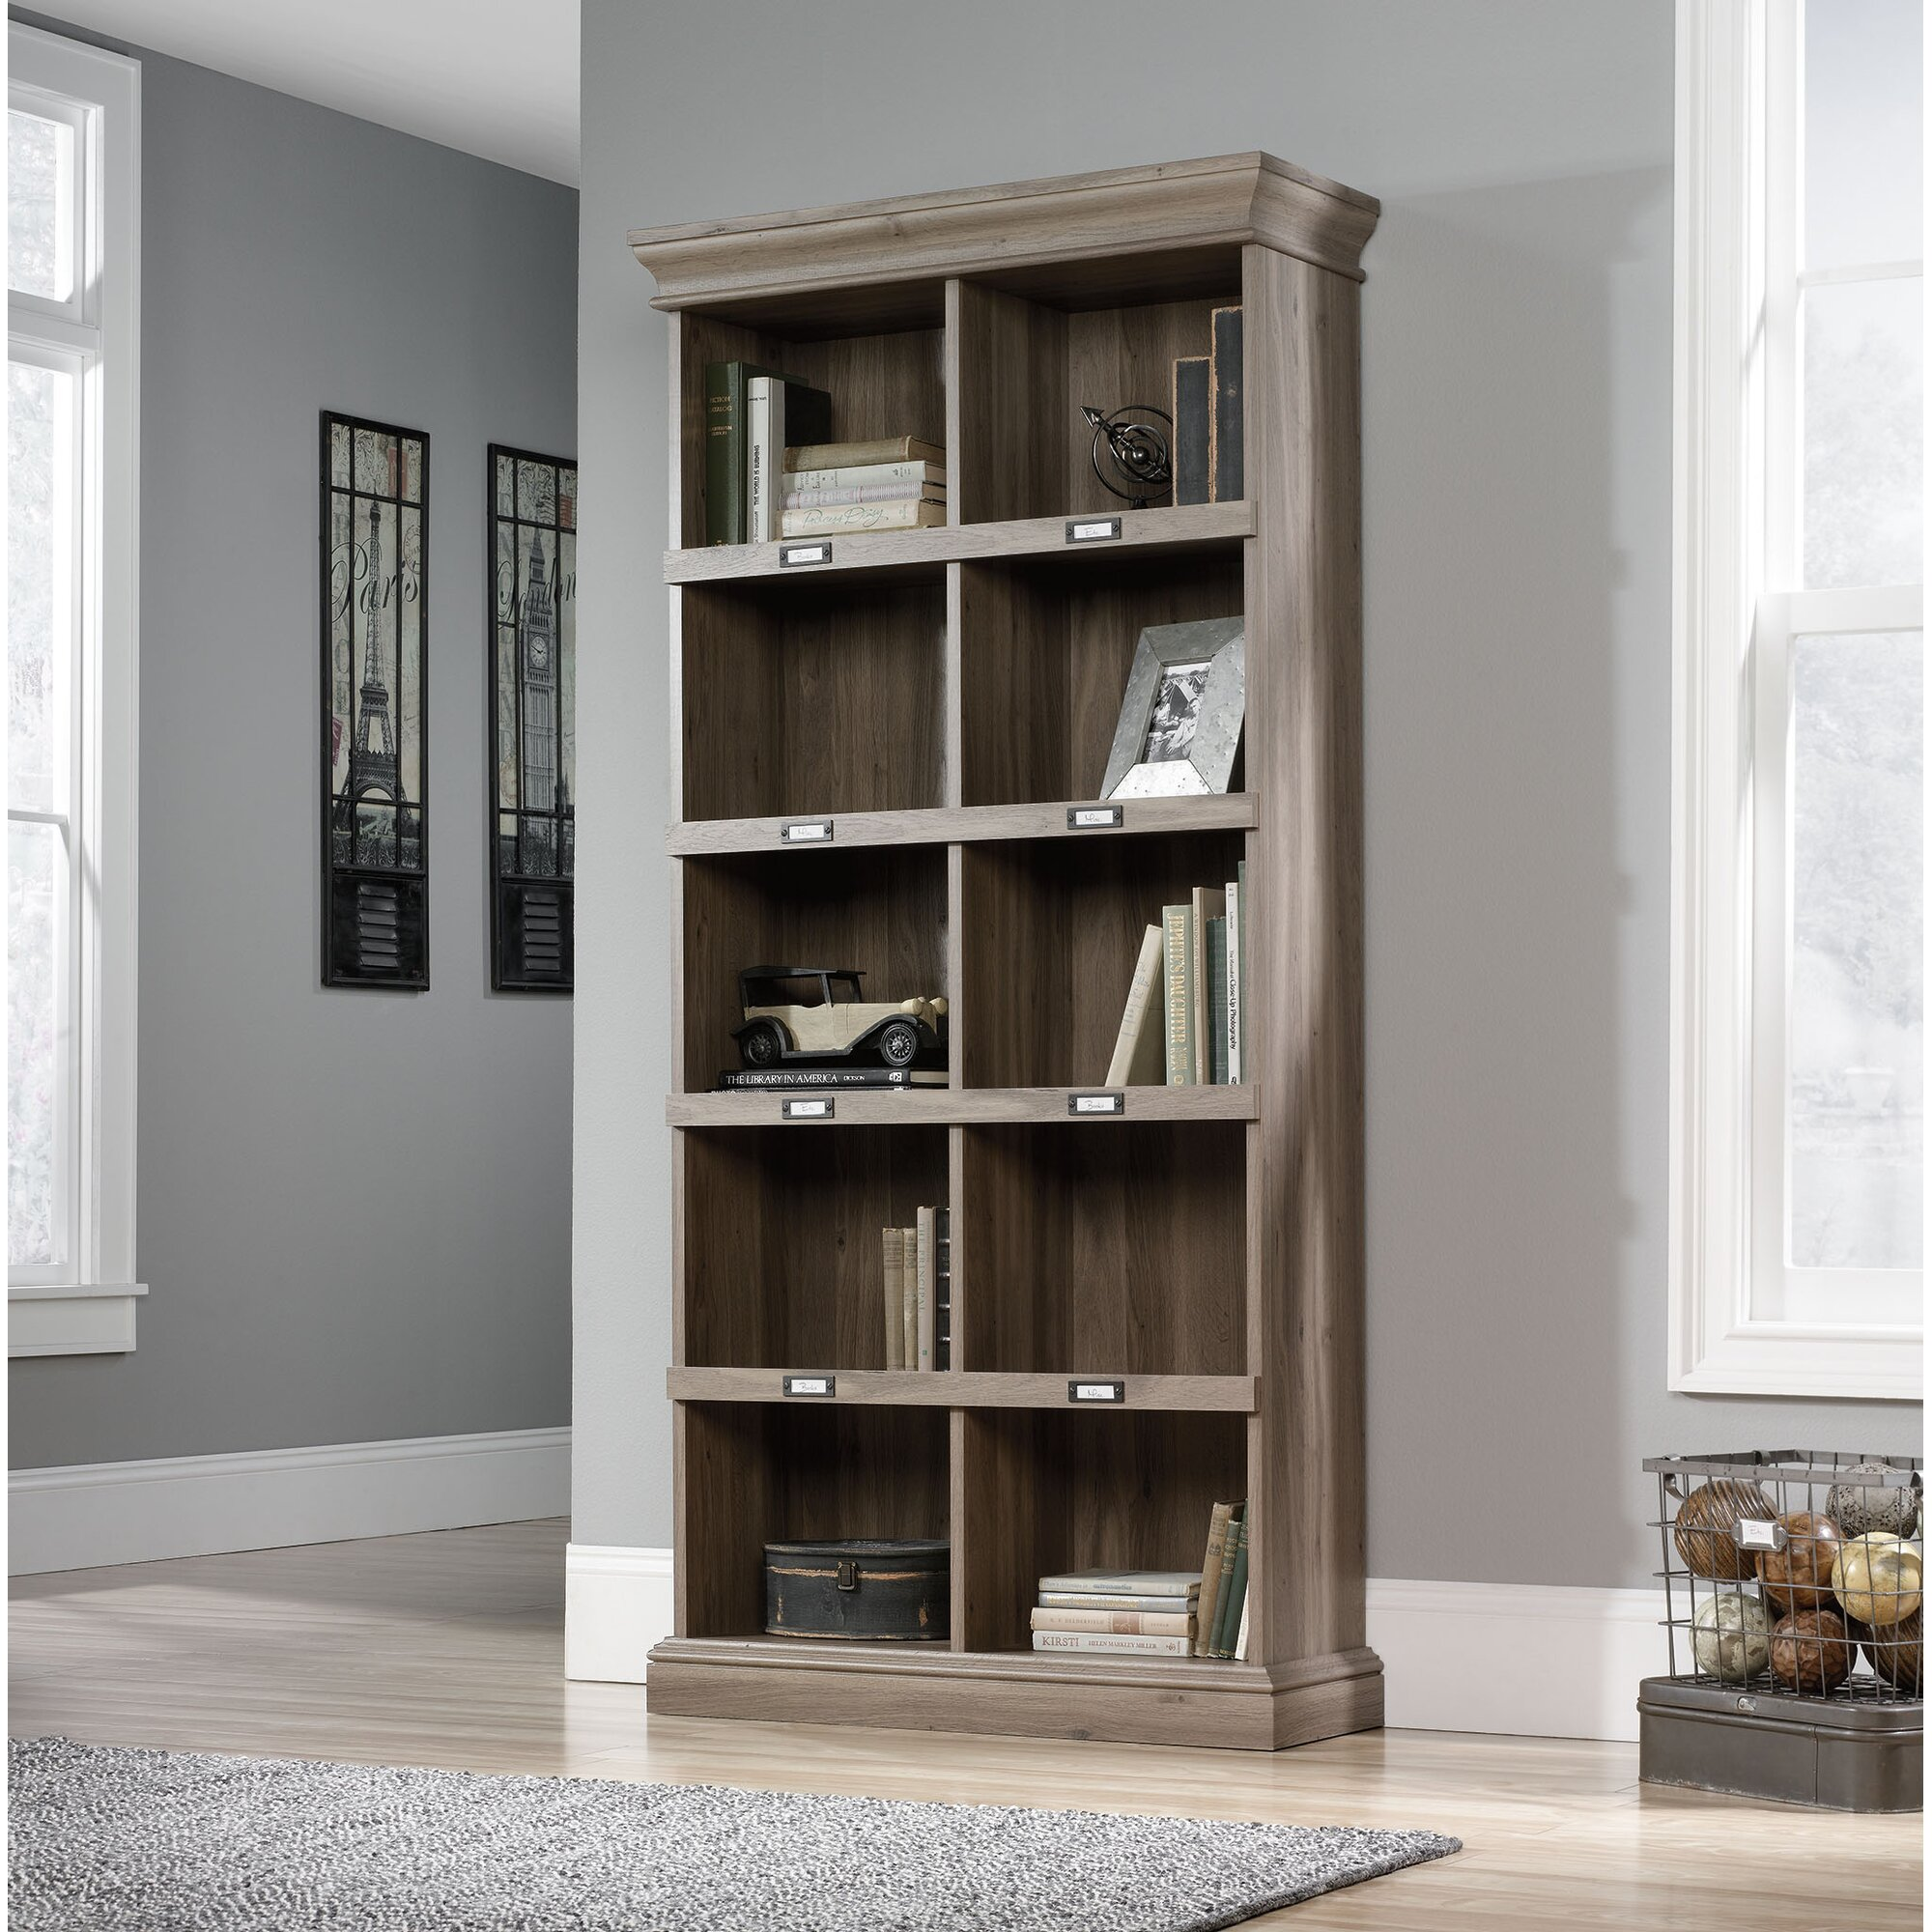 Bowerbank 75 Cube Unit Bookcase